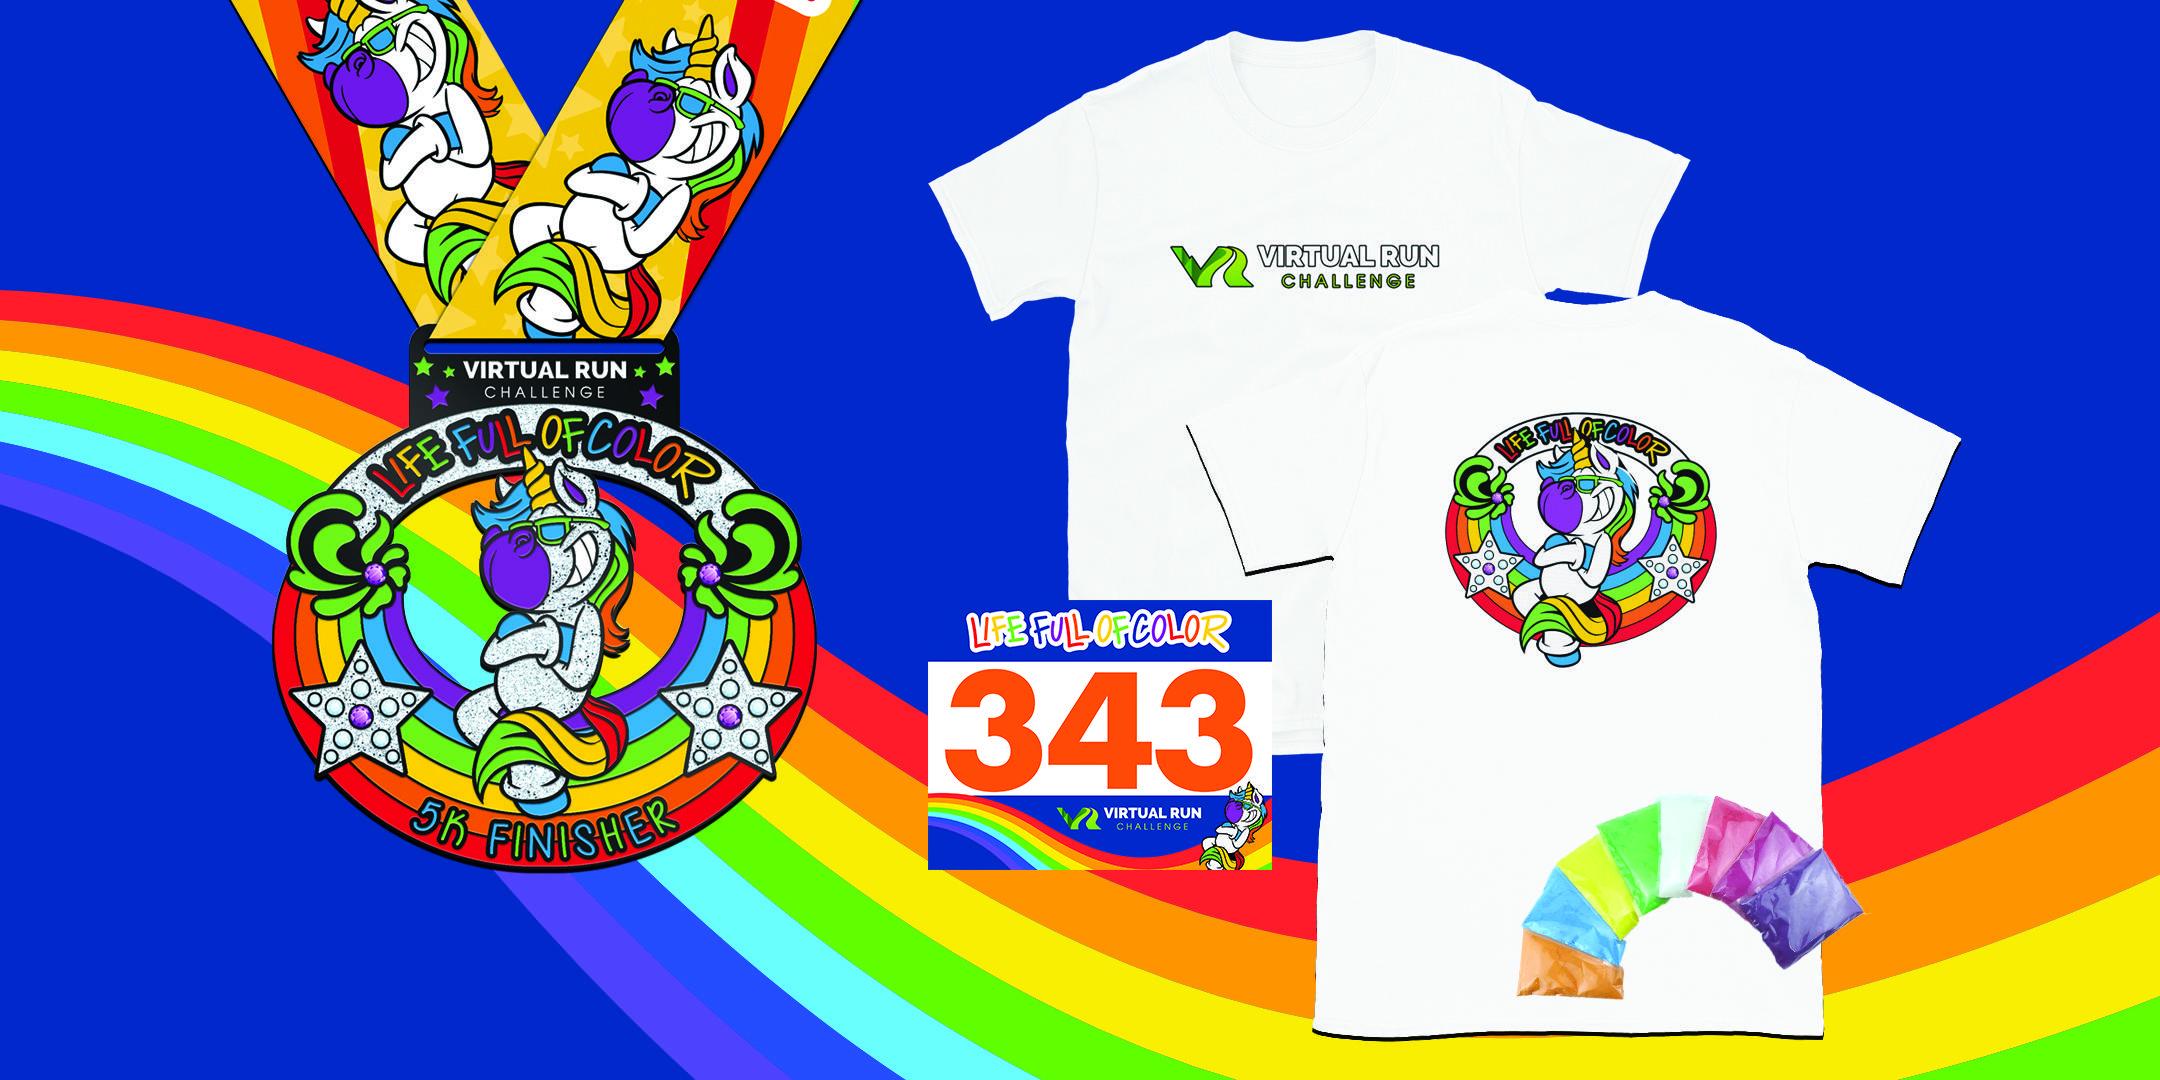 2020 Life Full of Color Virtual 5k Color Run- McAllen